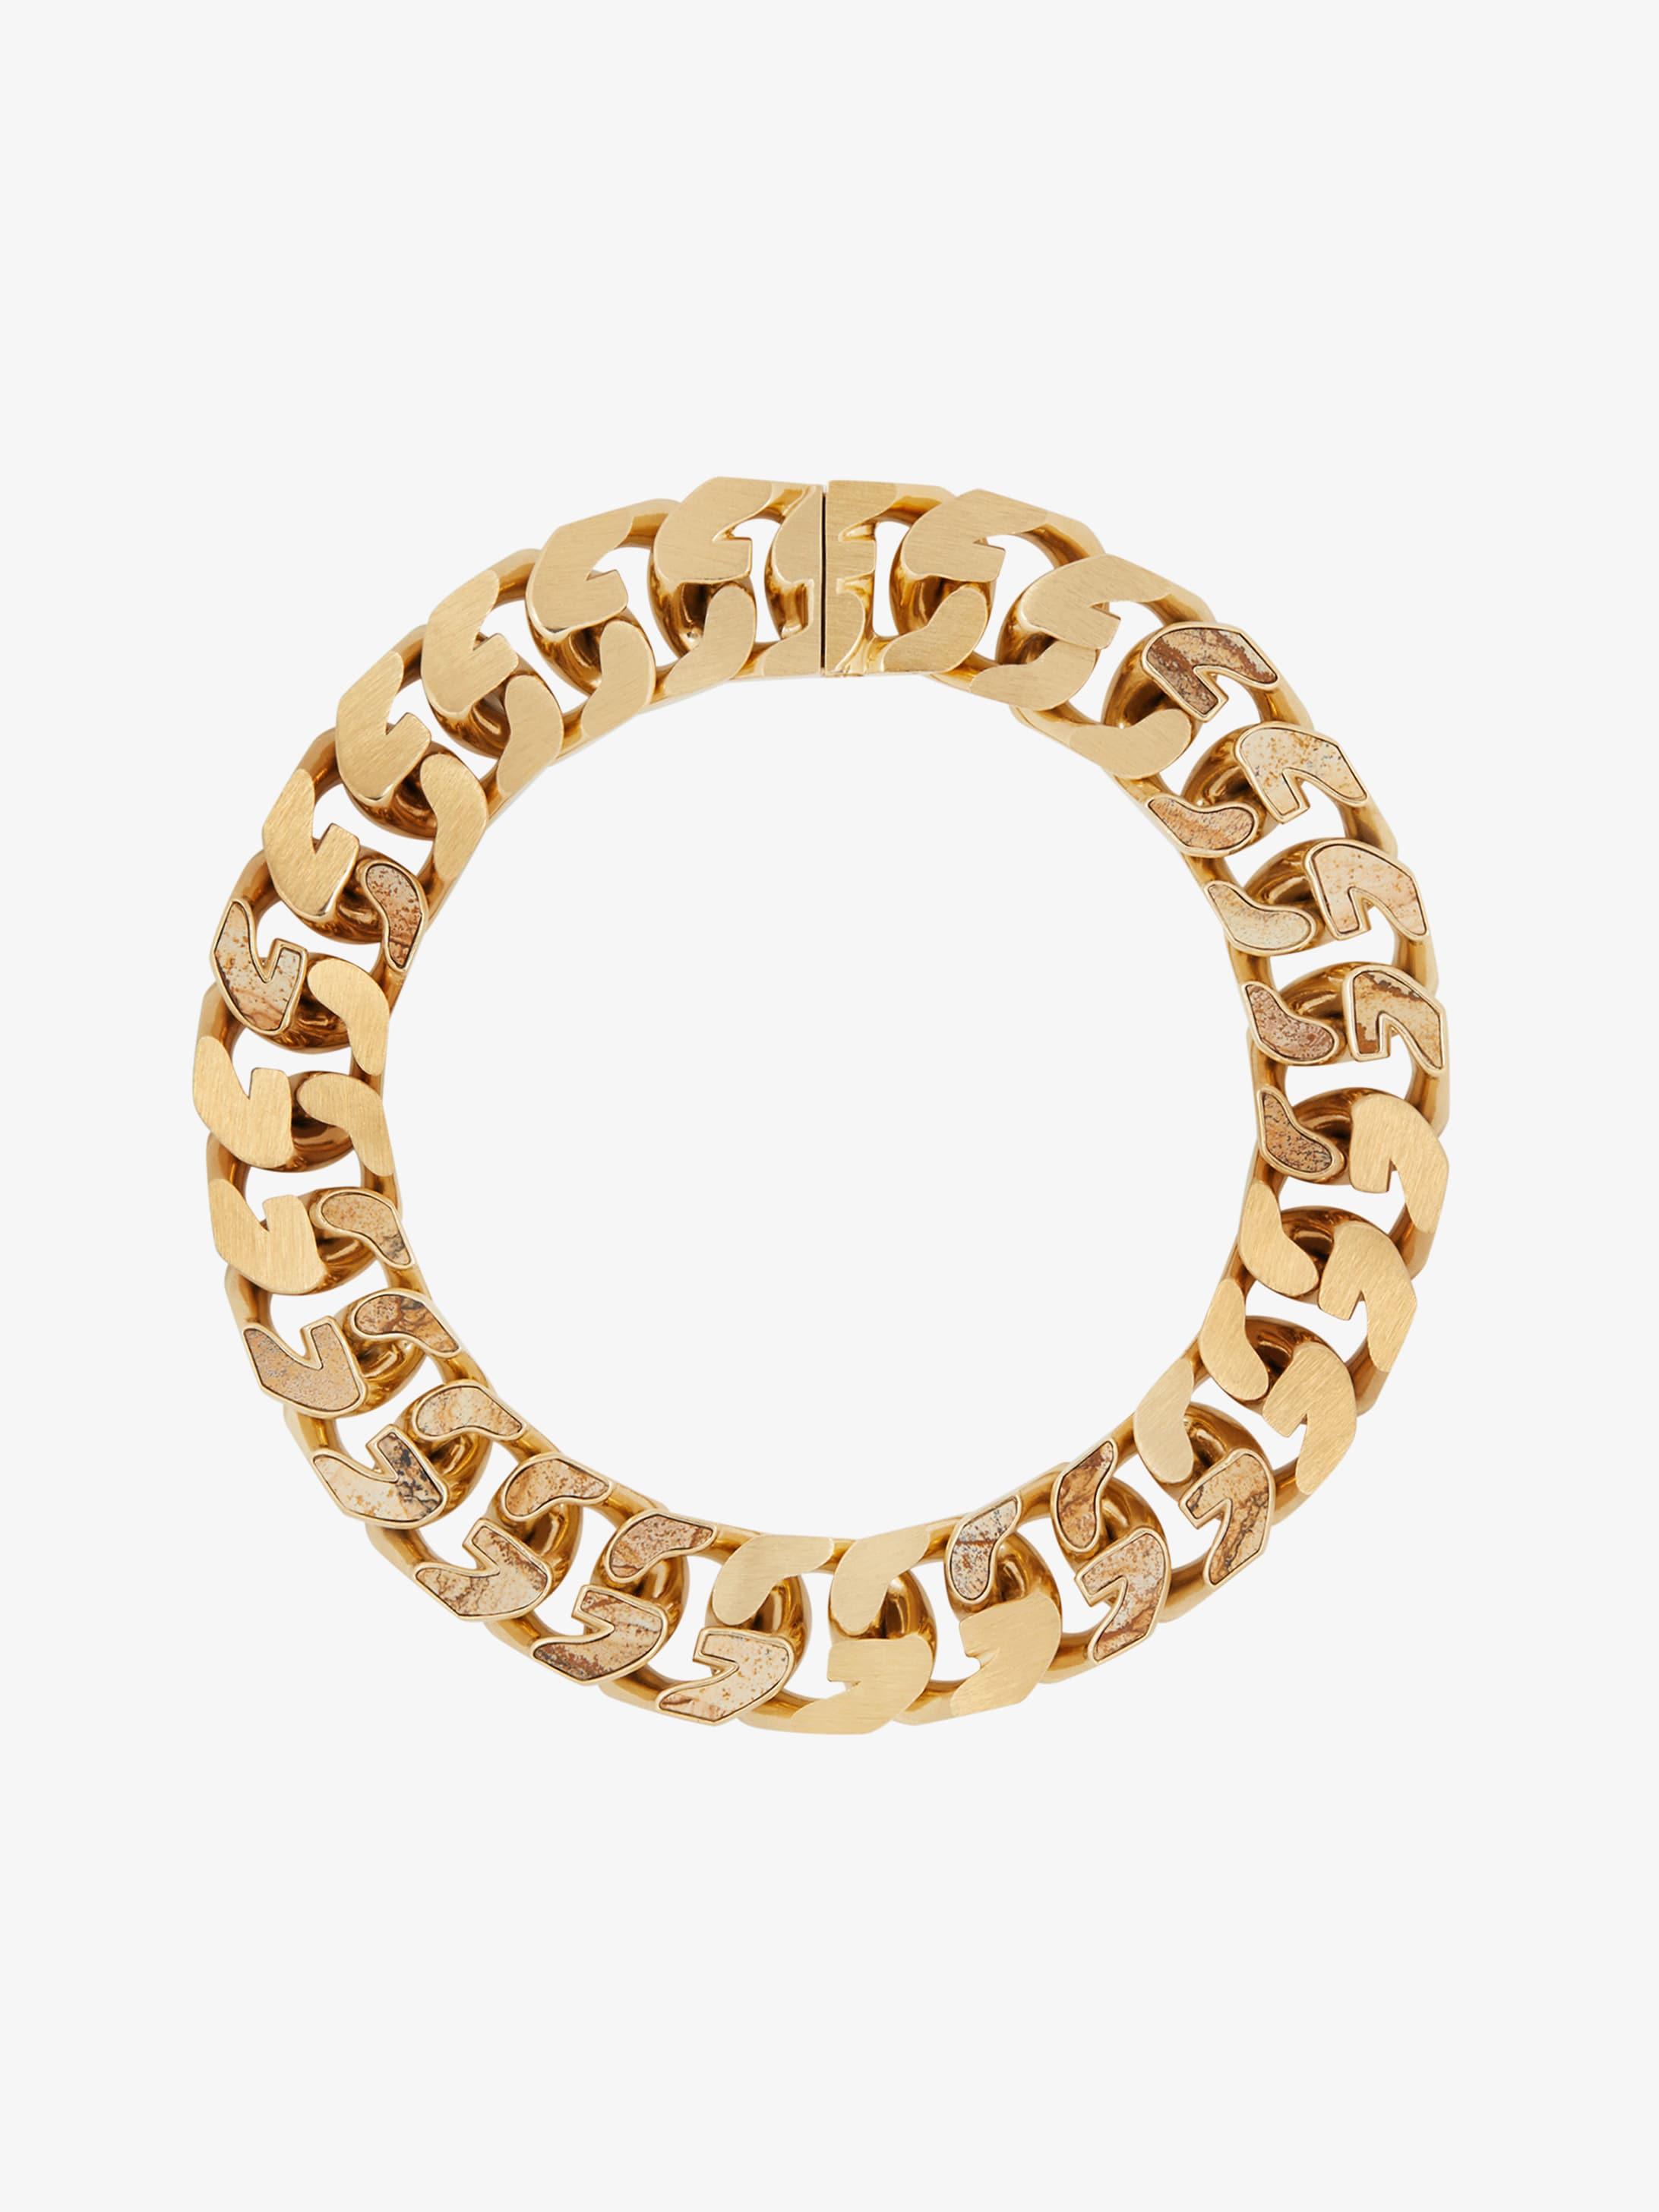 G Chain jasper set necklace